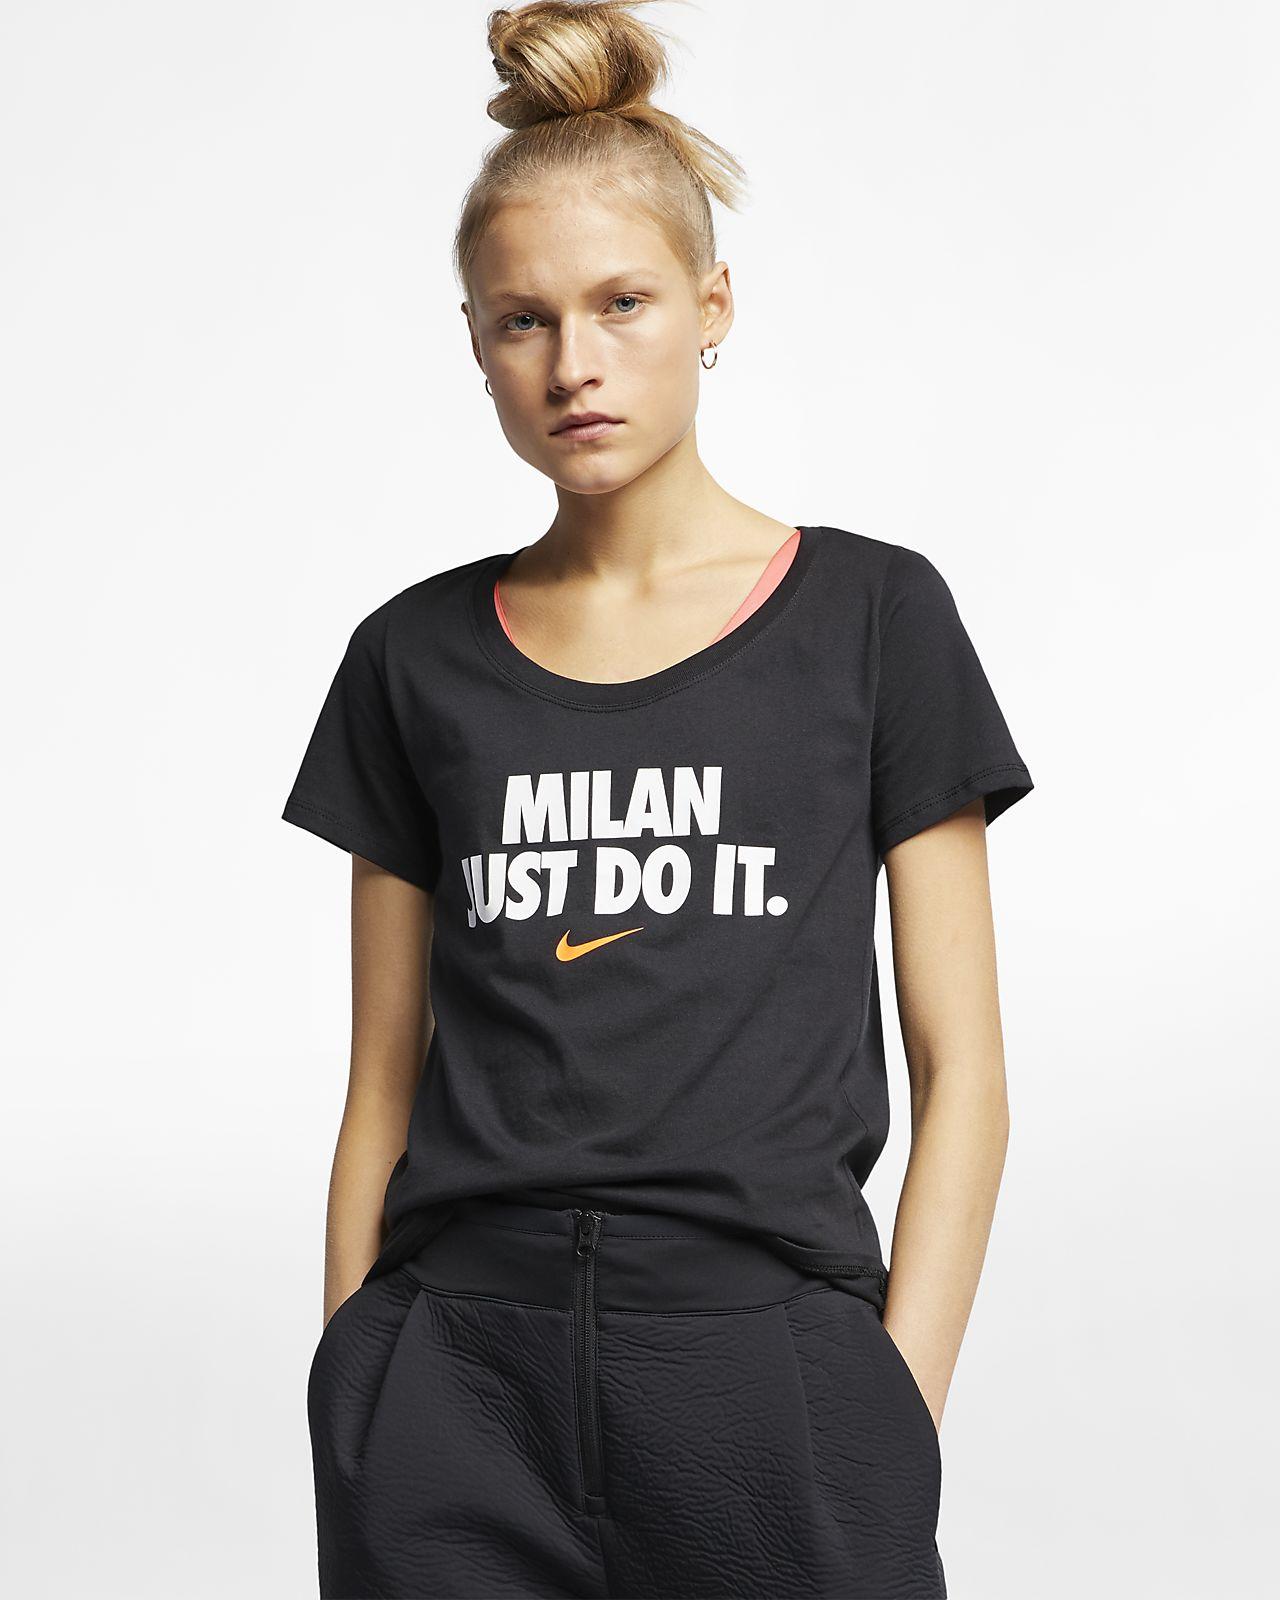 Nike Sportswear (Milan) Women's JDI T-Shirt